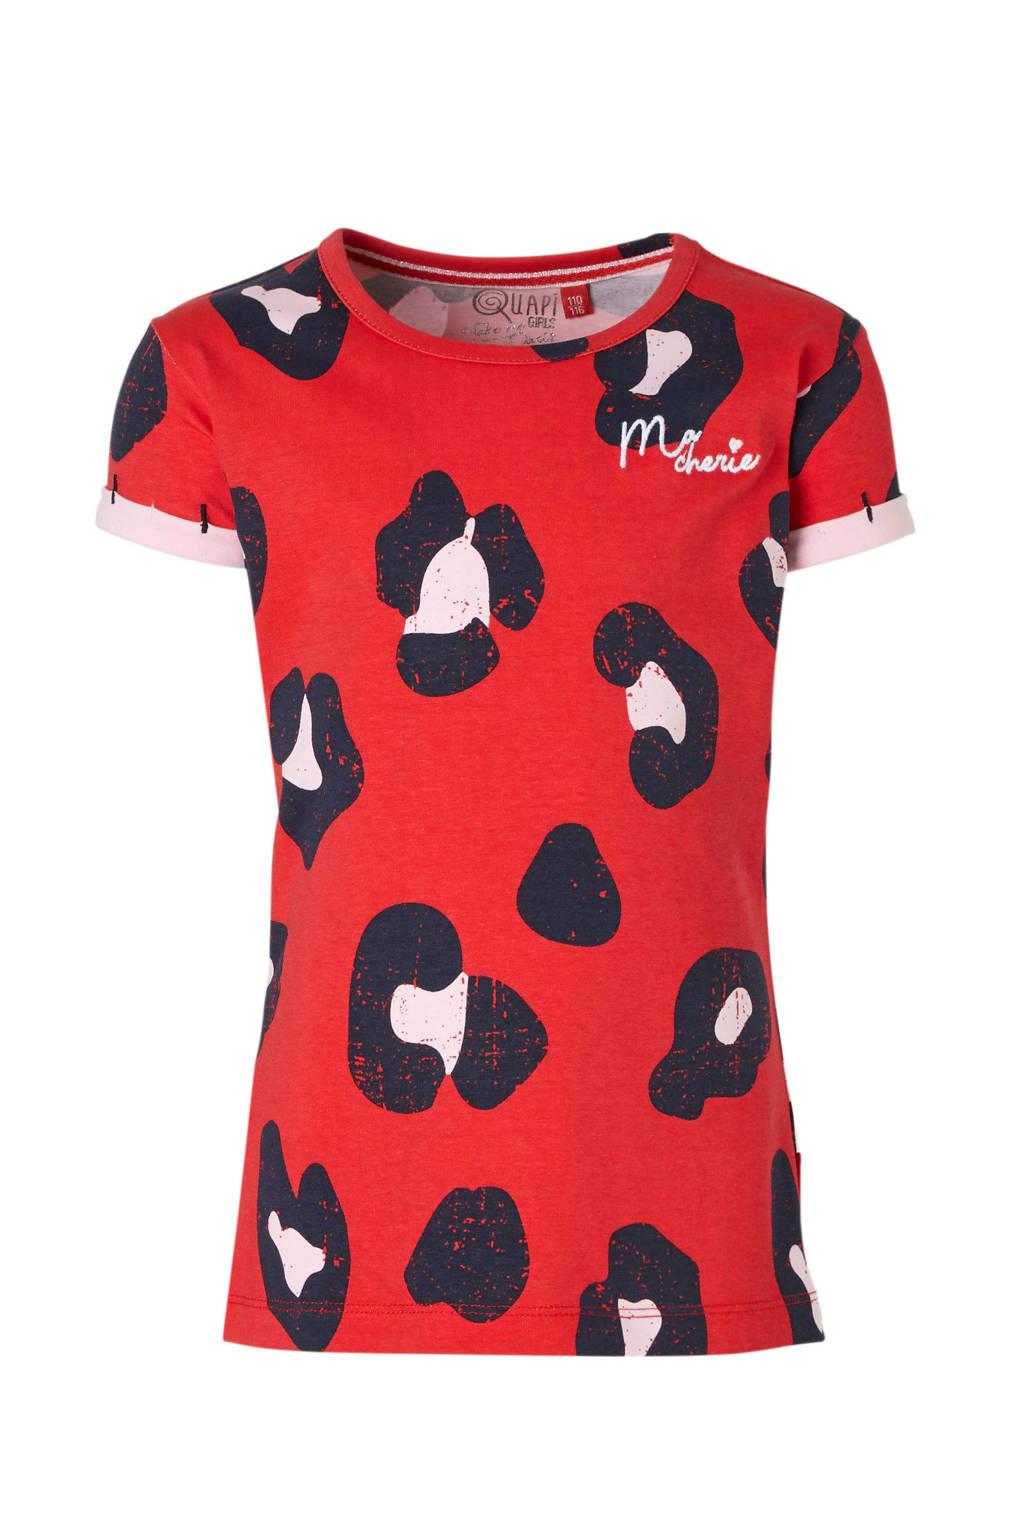 Quapi T-shirt Sissy met panterprint rood, Rood